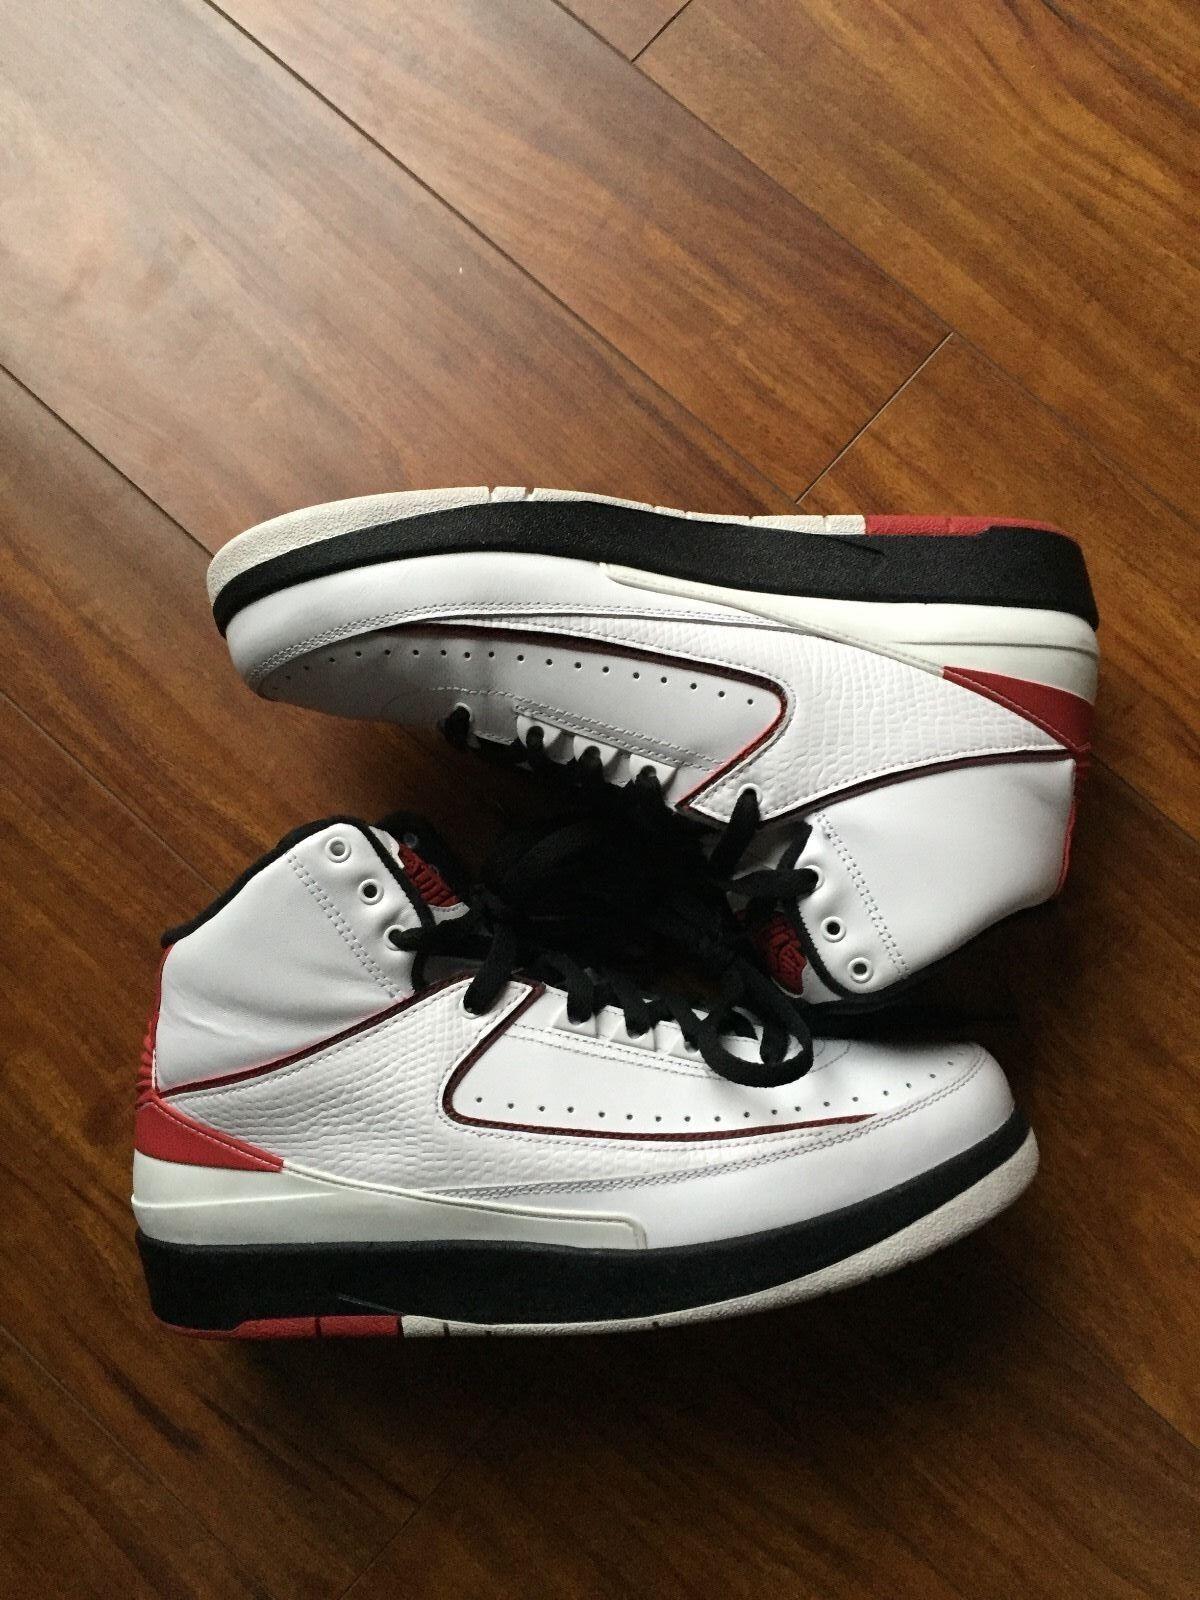 Jordan Retro 2 White/Black/Varsity Red Sz 9